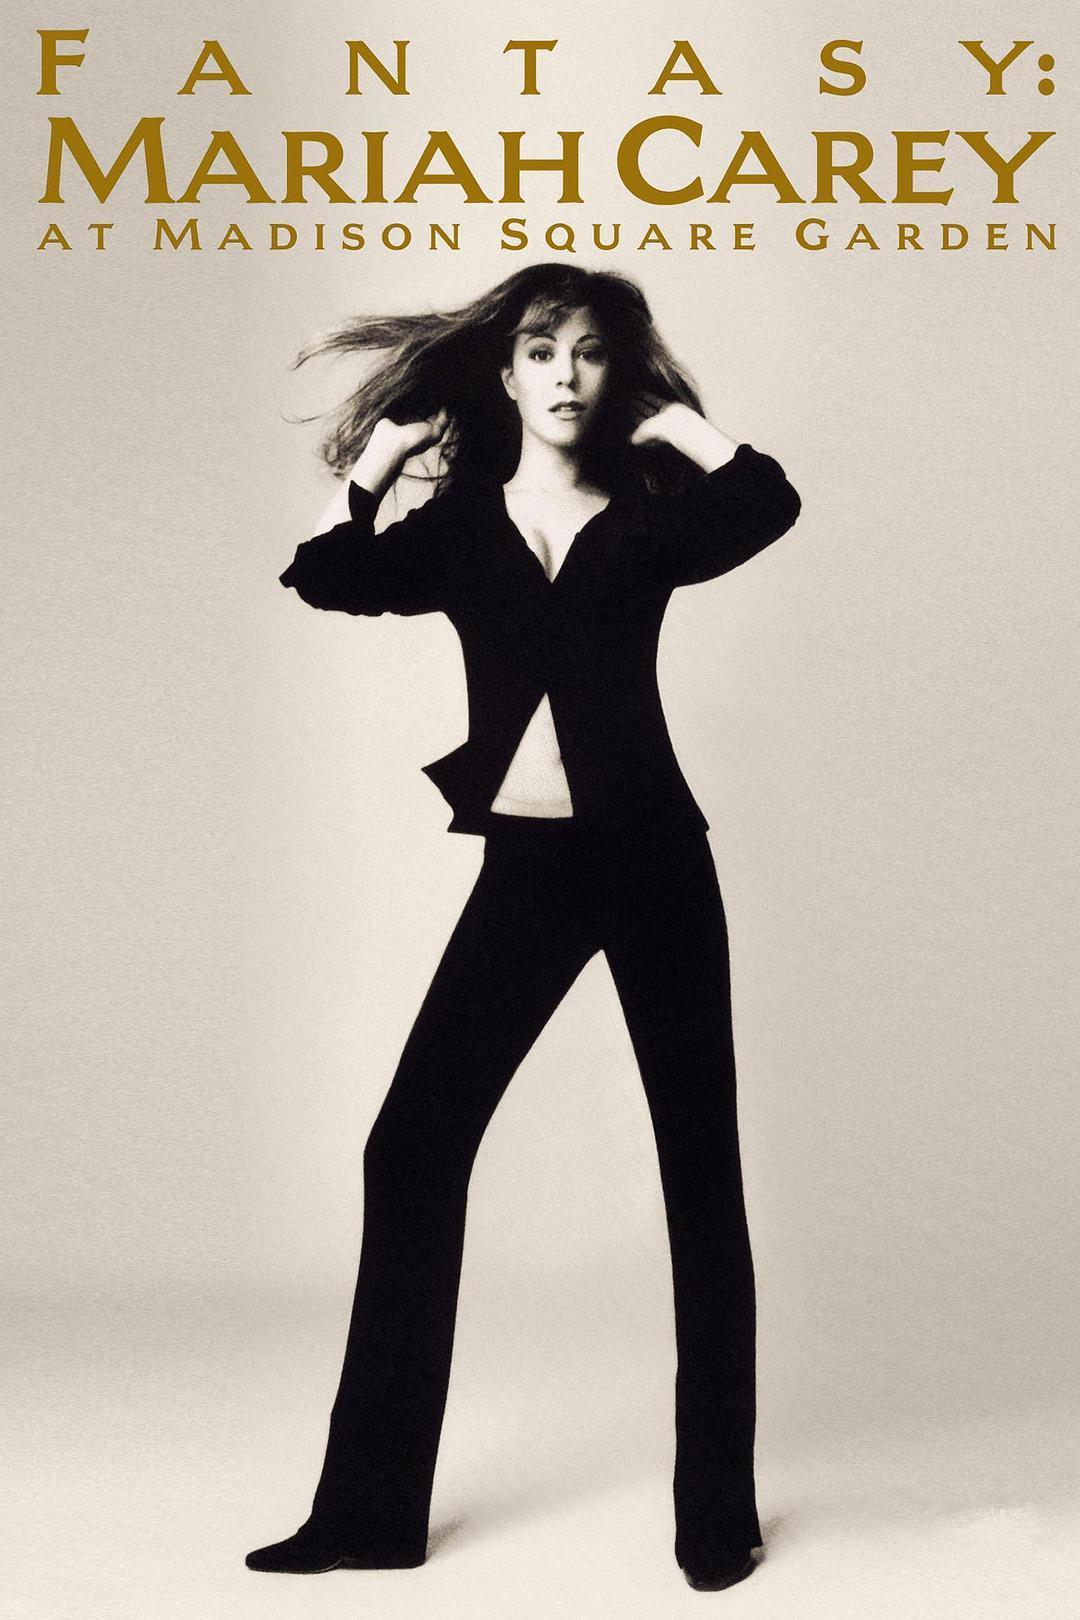 Fantasy: Mariah Carey at Madison Square Garden (Live)